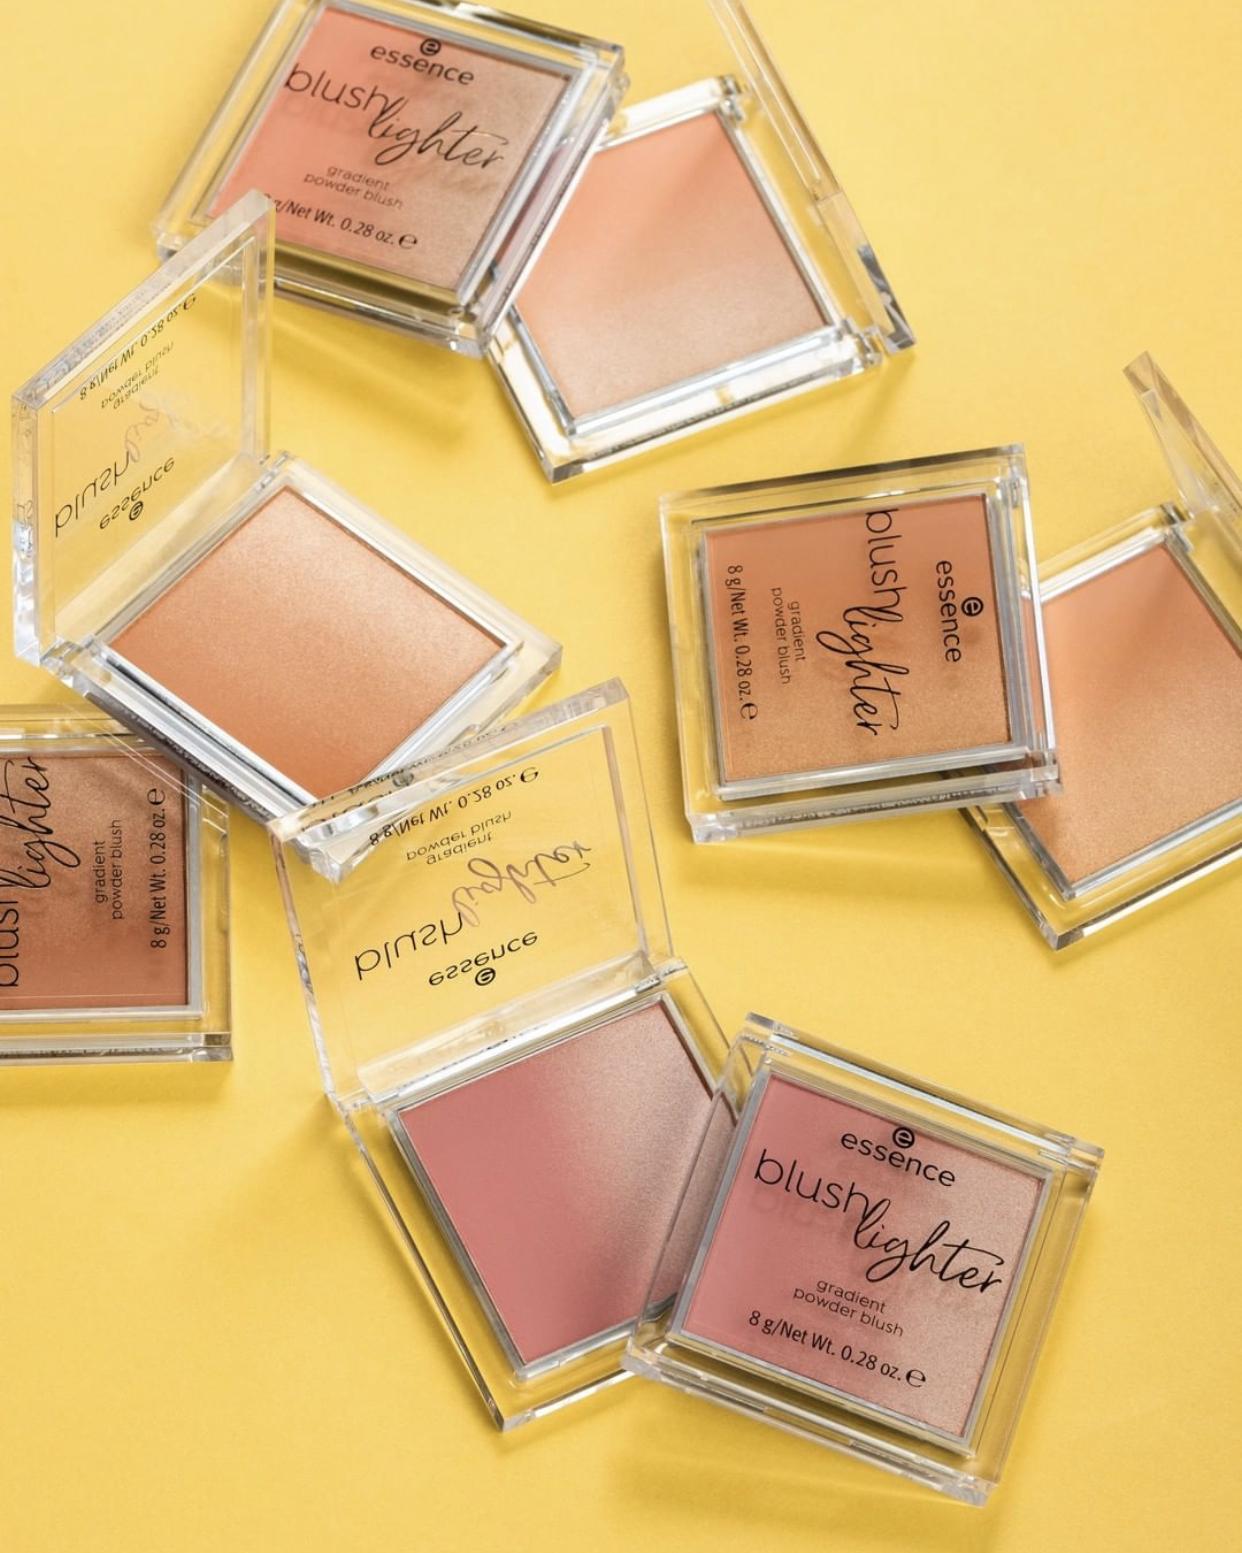 Essence Blush Lighter Gradient Powder Blush